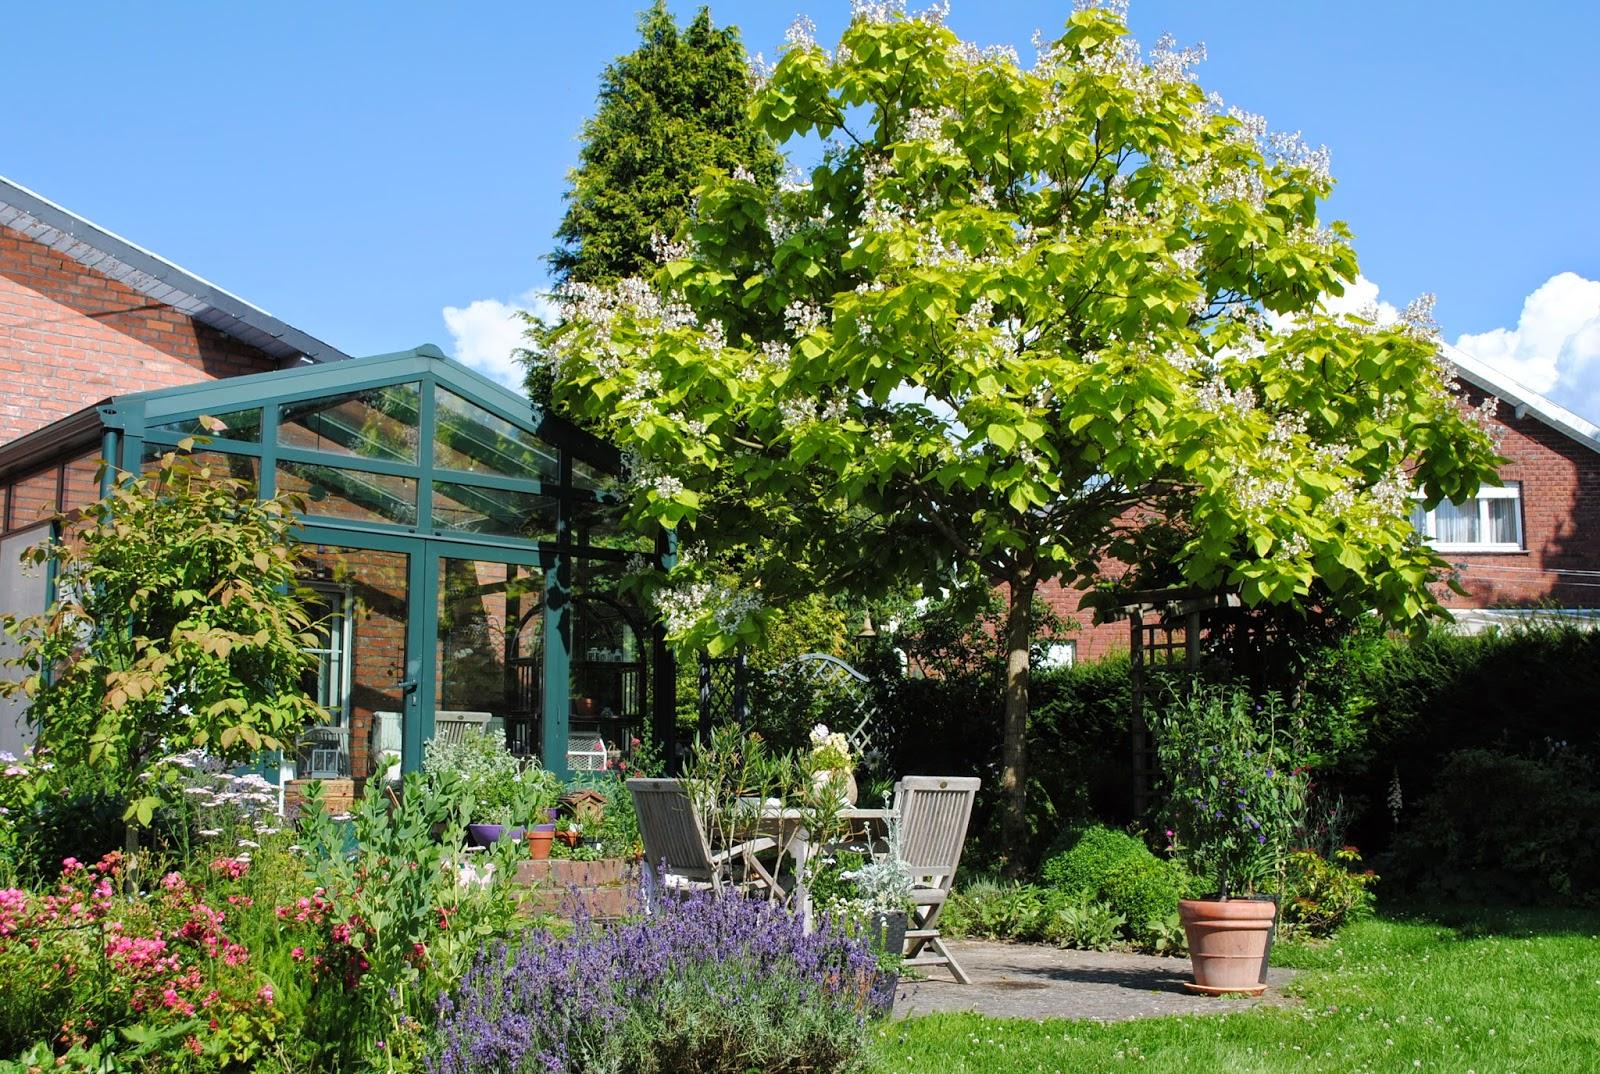 la passion d 39 anne marie le jardin en juillet. Black Bedroom Furniture Sets. Home Design Ideas